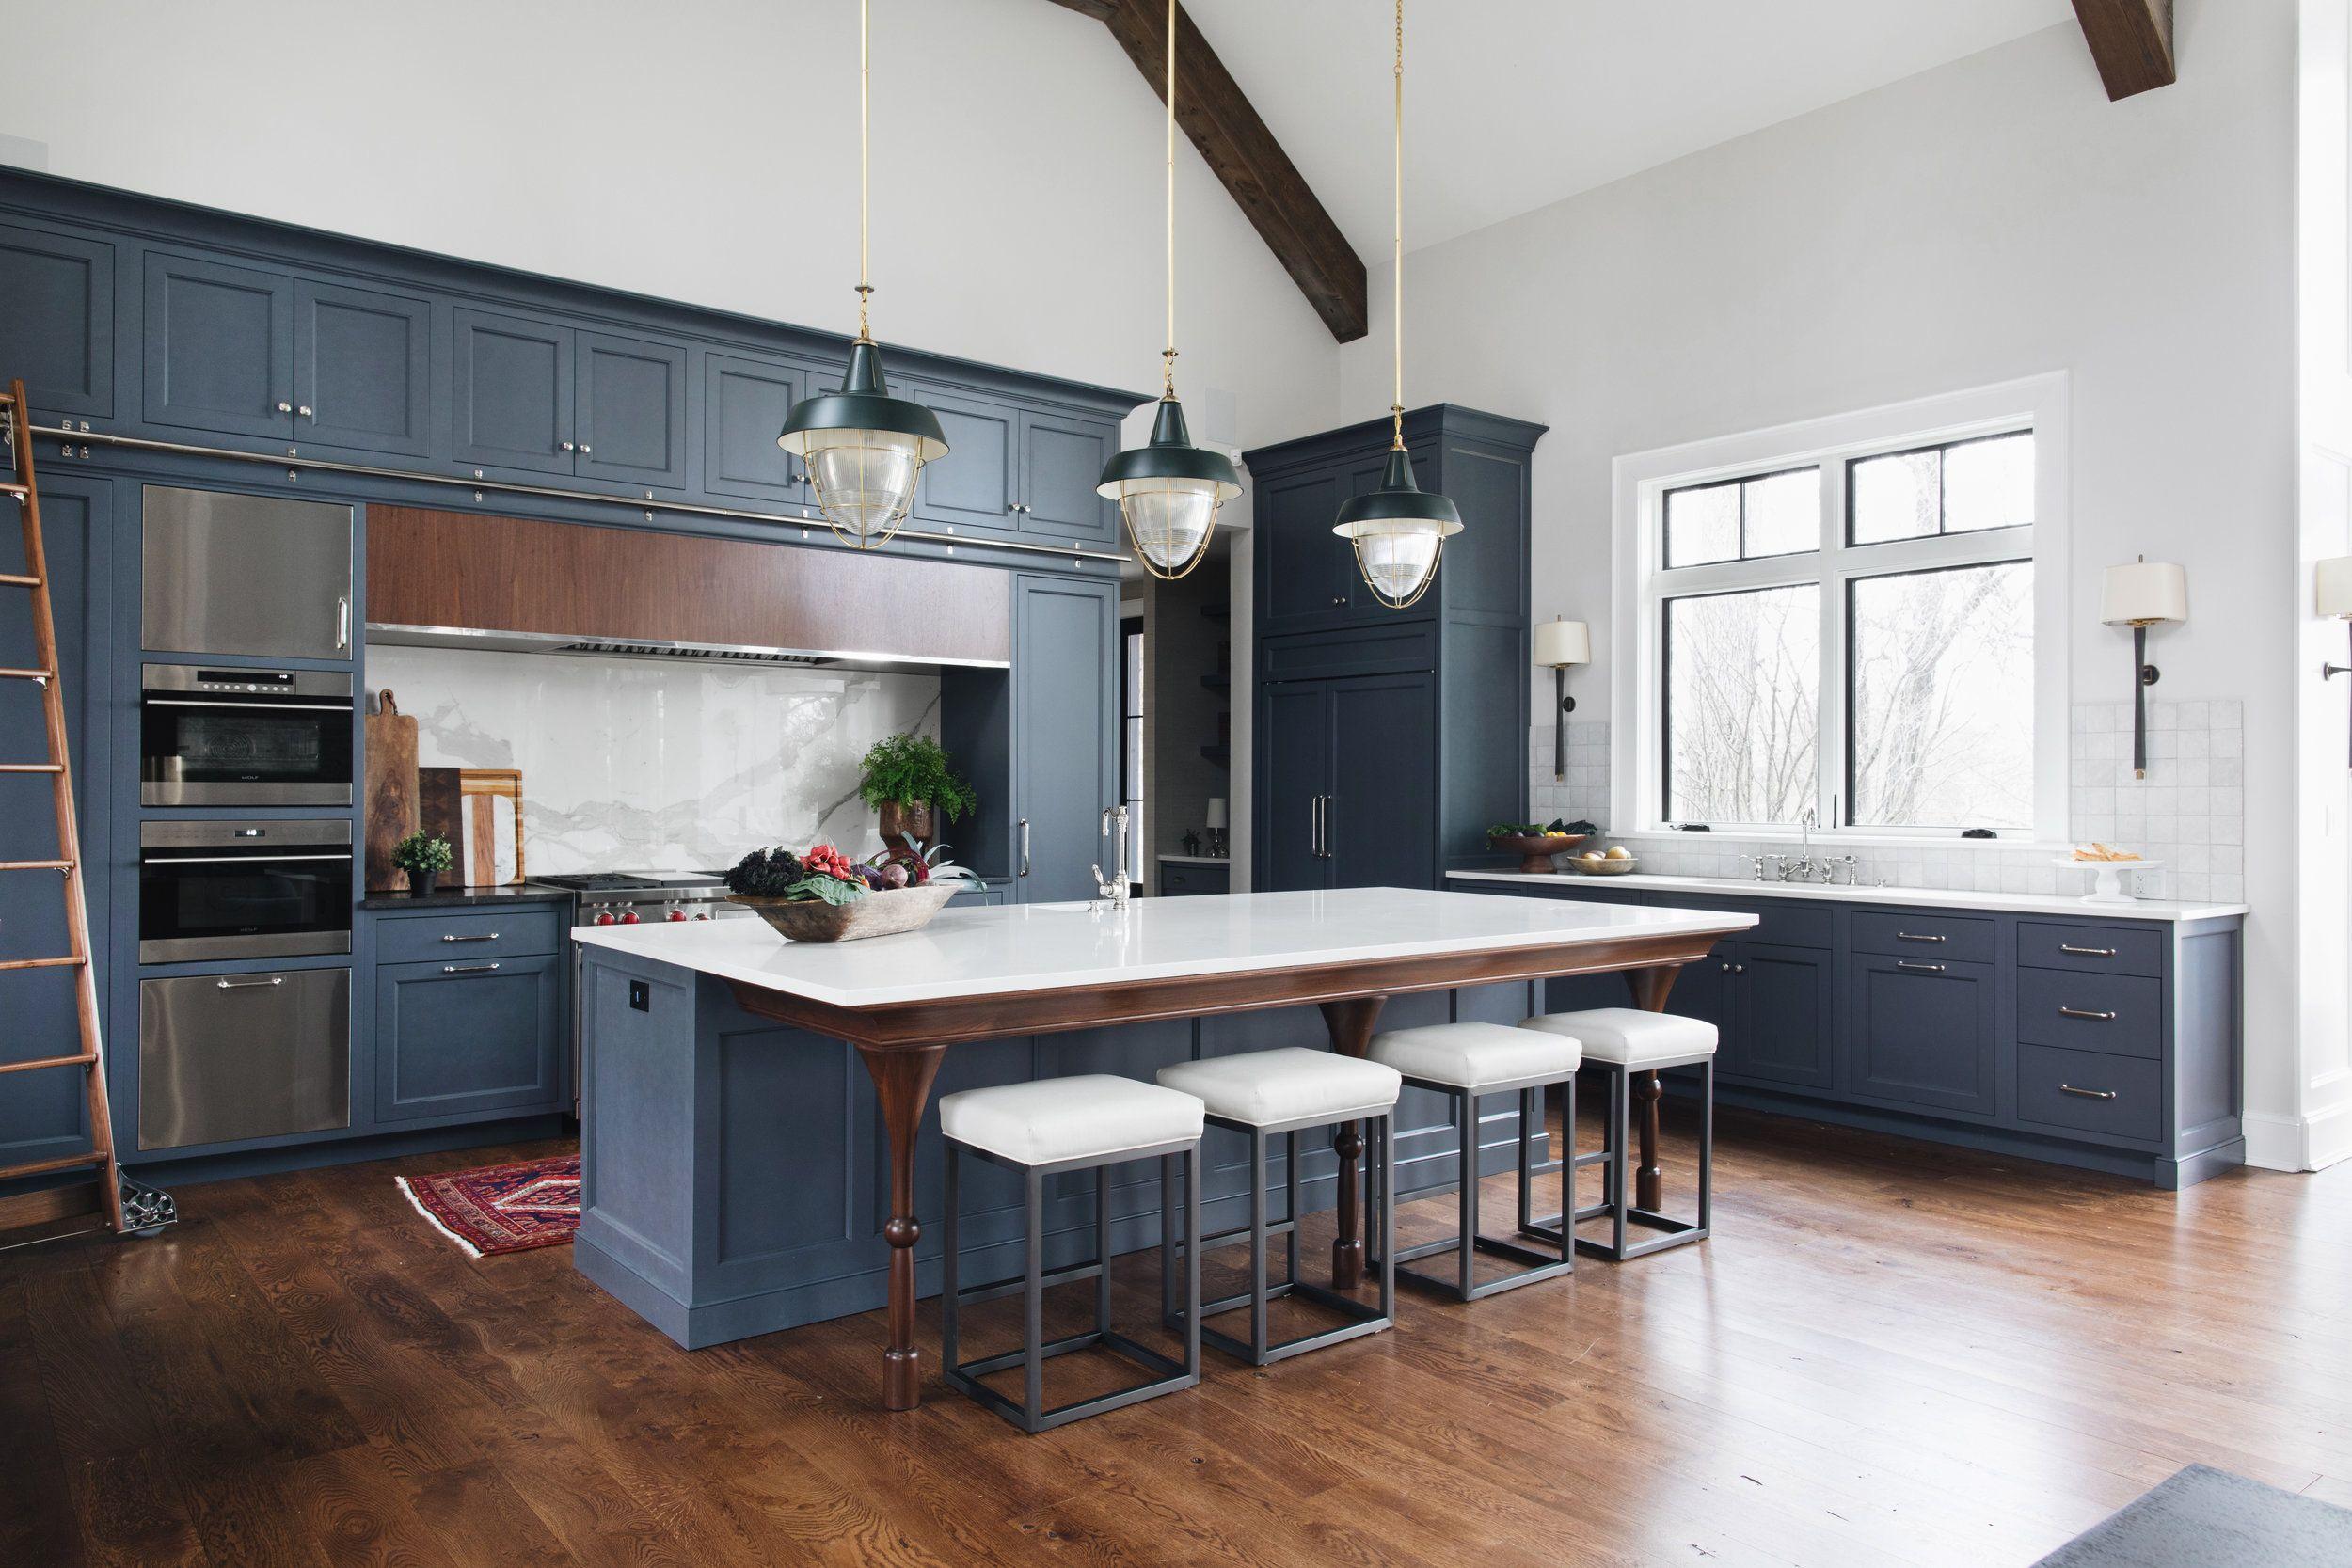 pin by monica lynn on dream kitchens blue kitchen cabinets blue shaker kitchen dark blue on kitchen cabinets blue id=40379